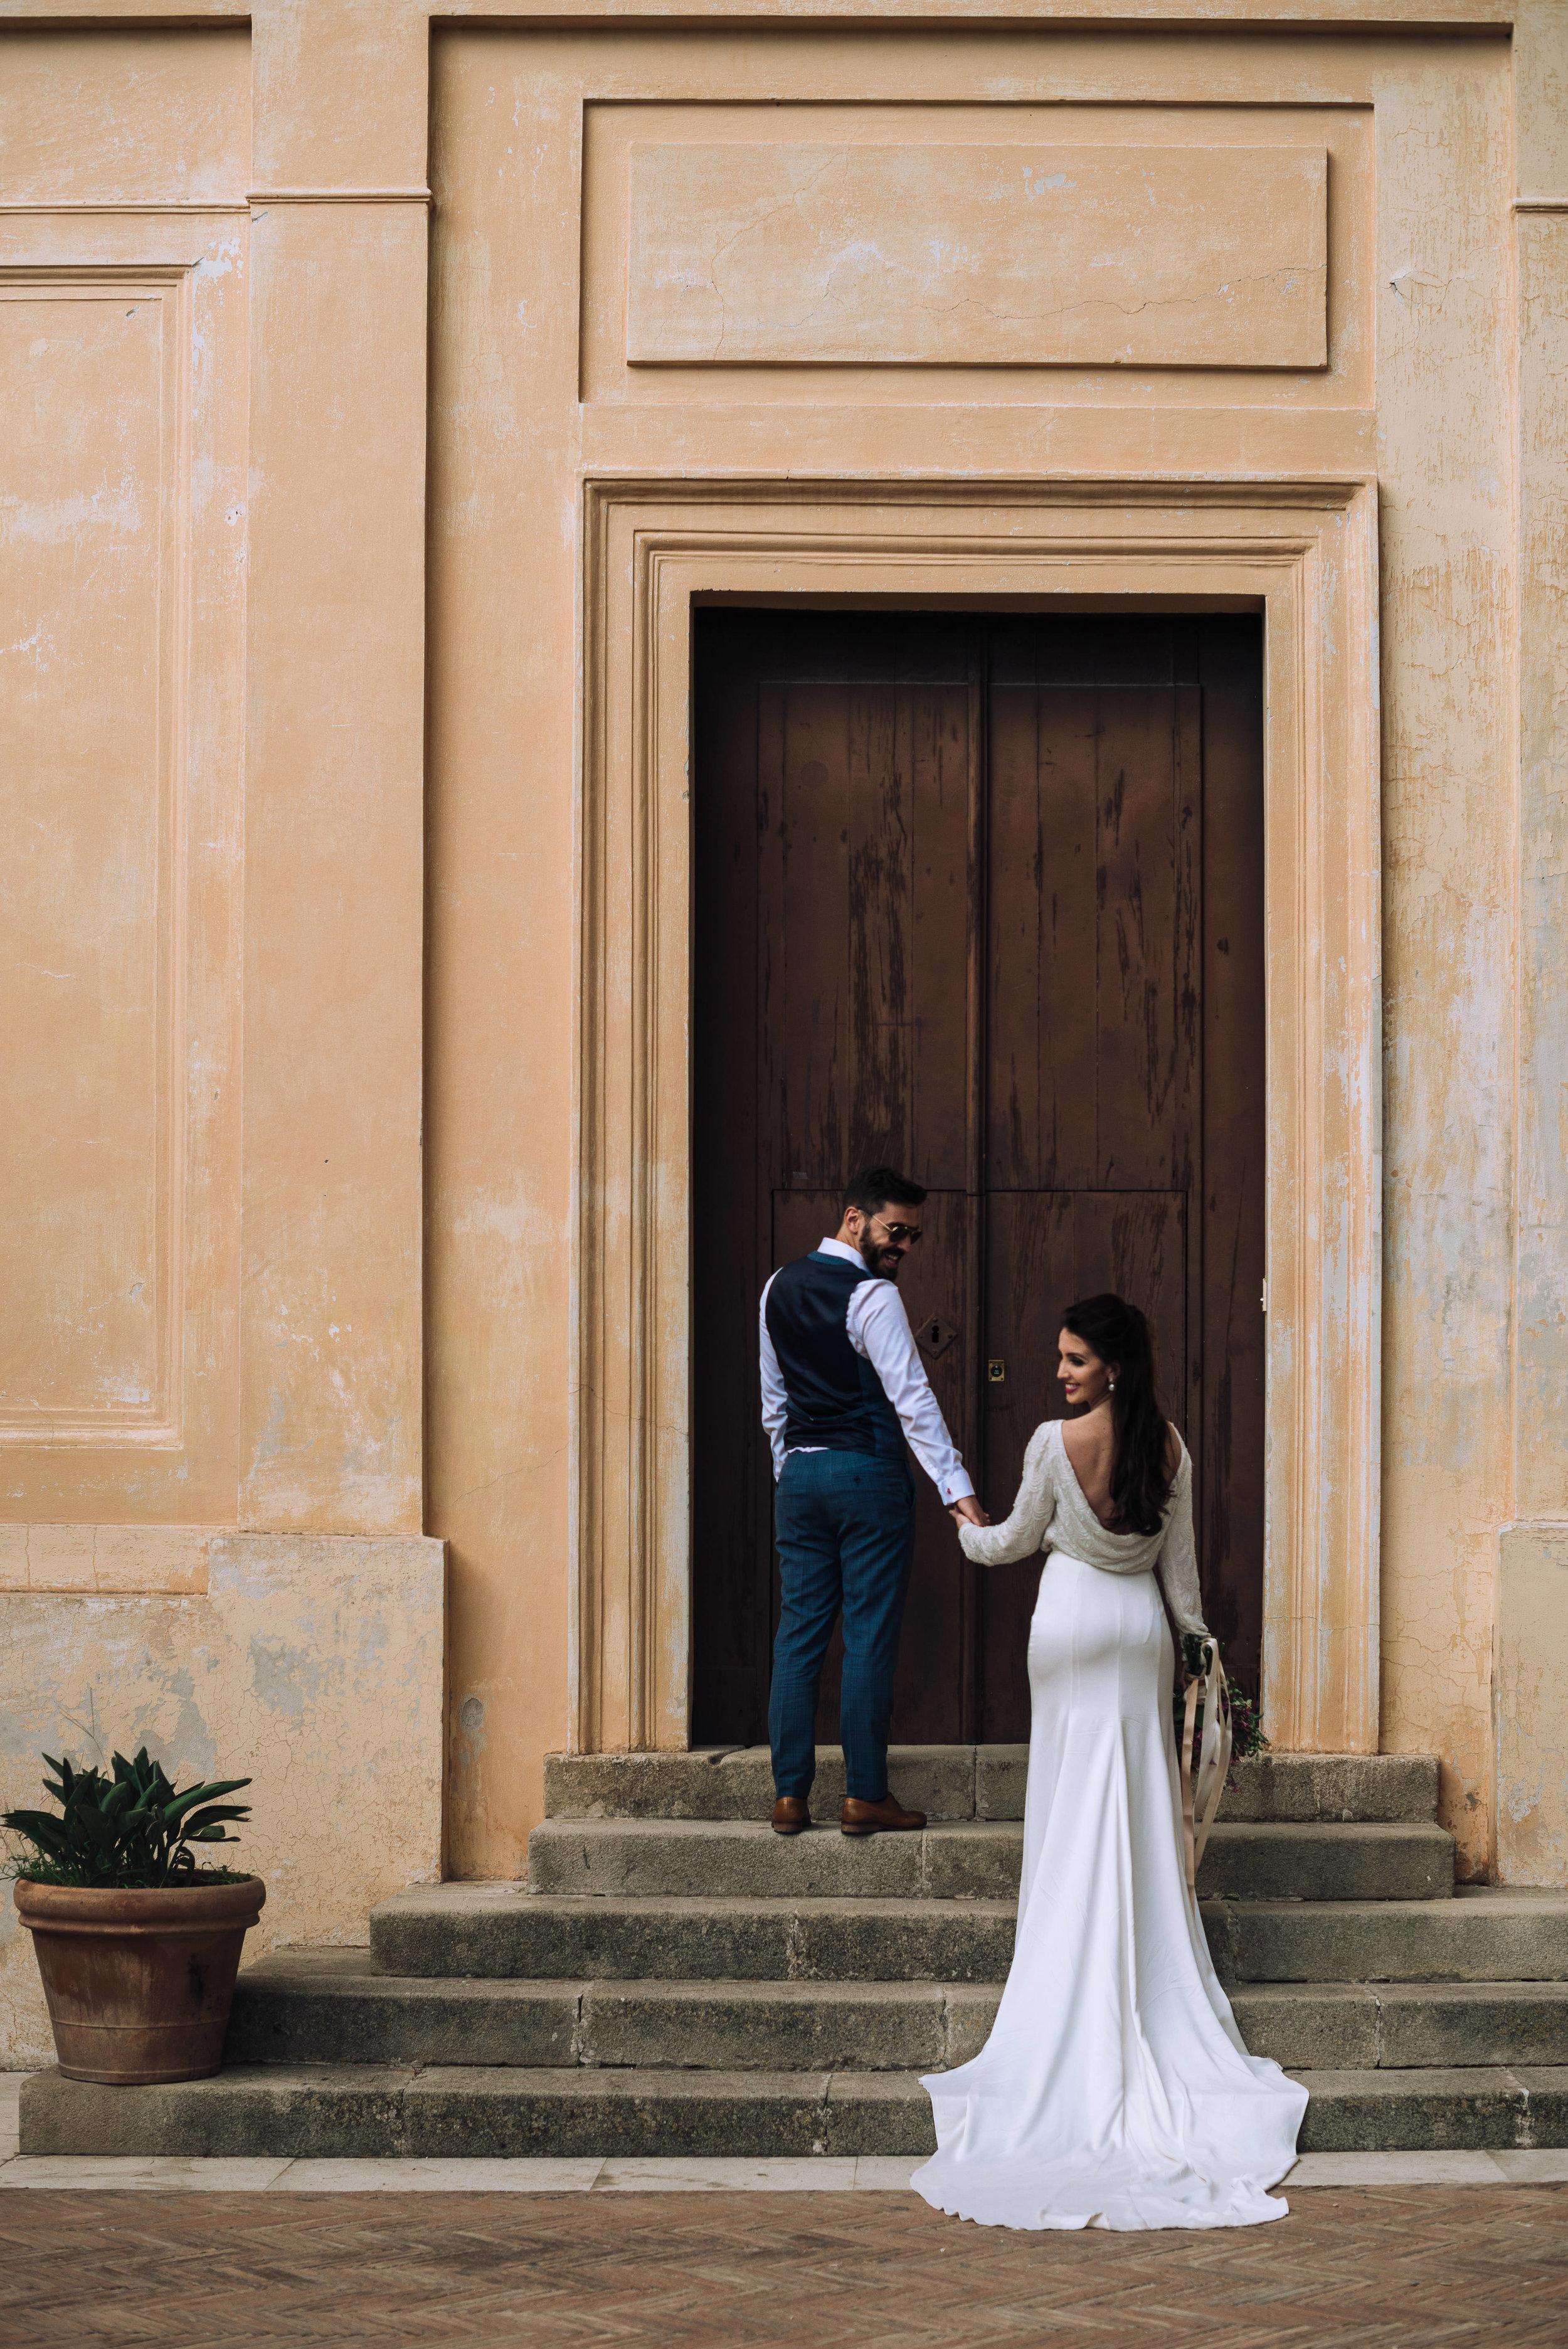 Nina Rose Bridal, Electra Dress. Chloe Rimmer Italy 2.jpg